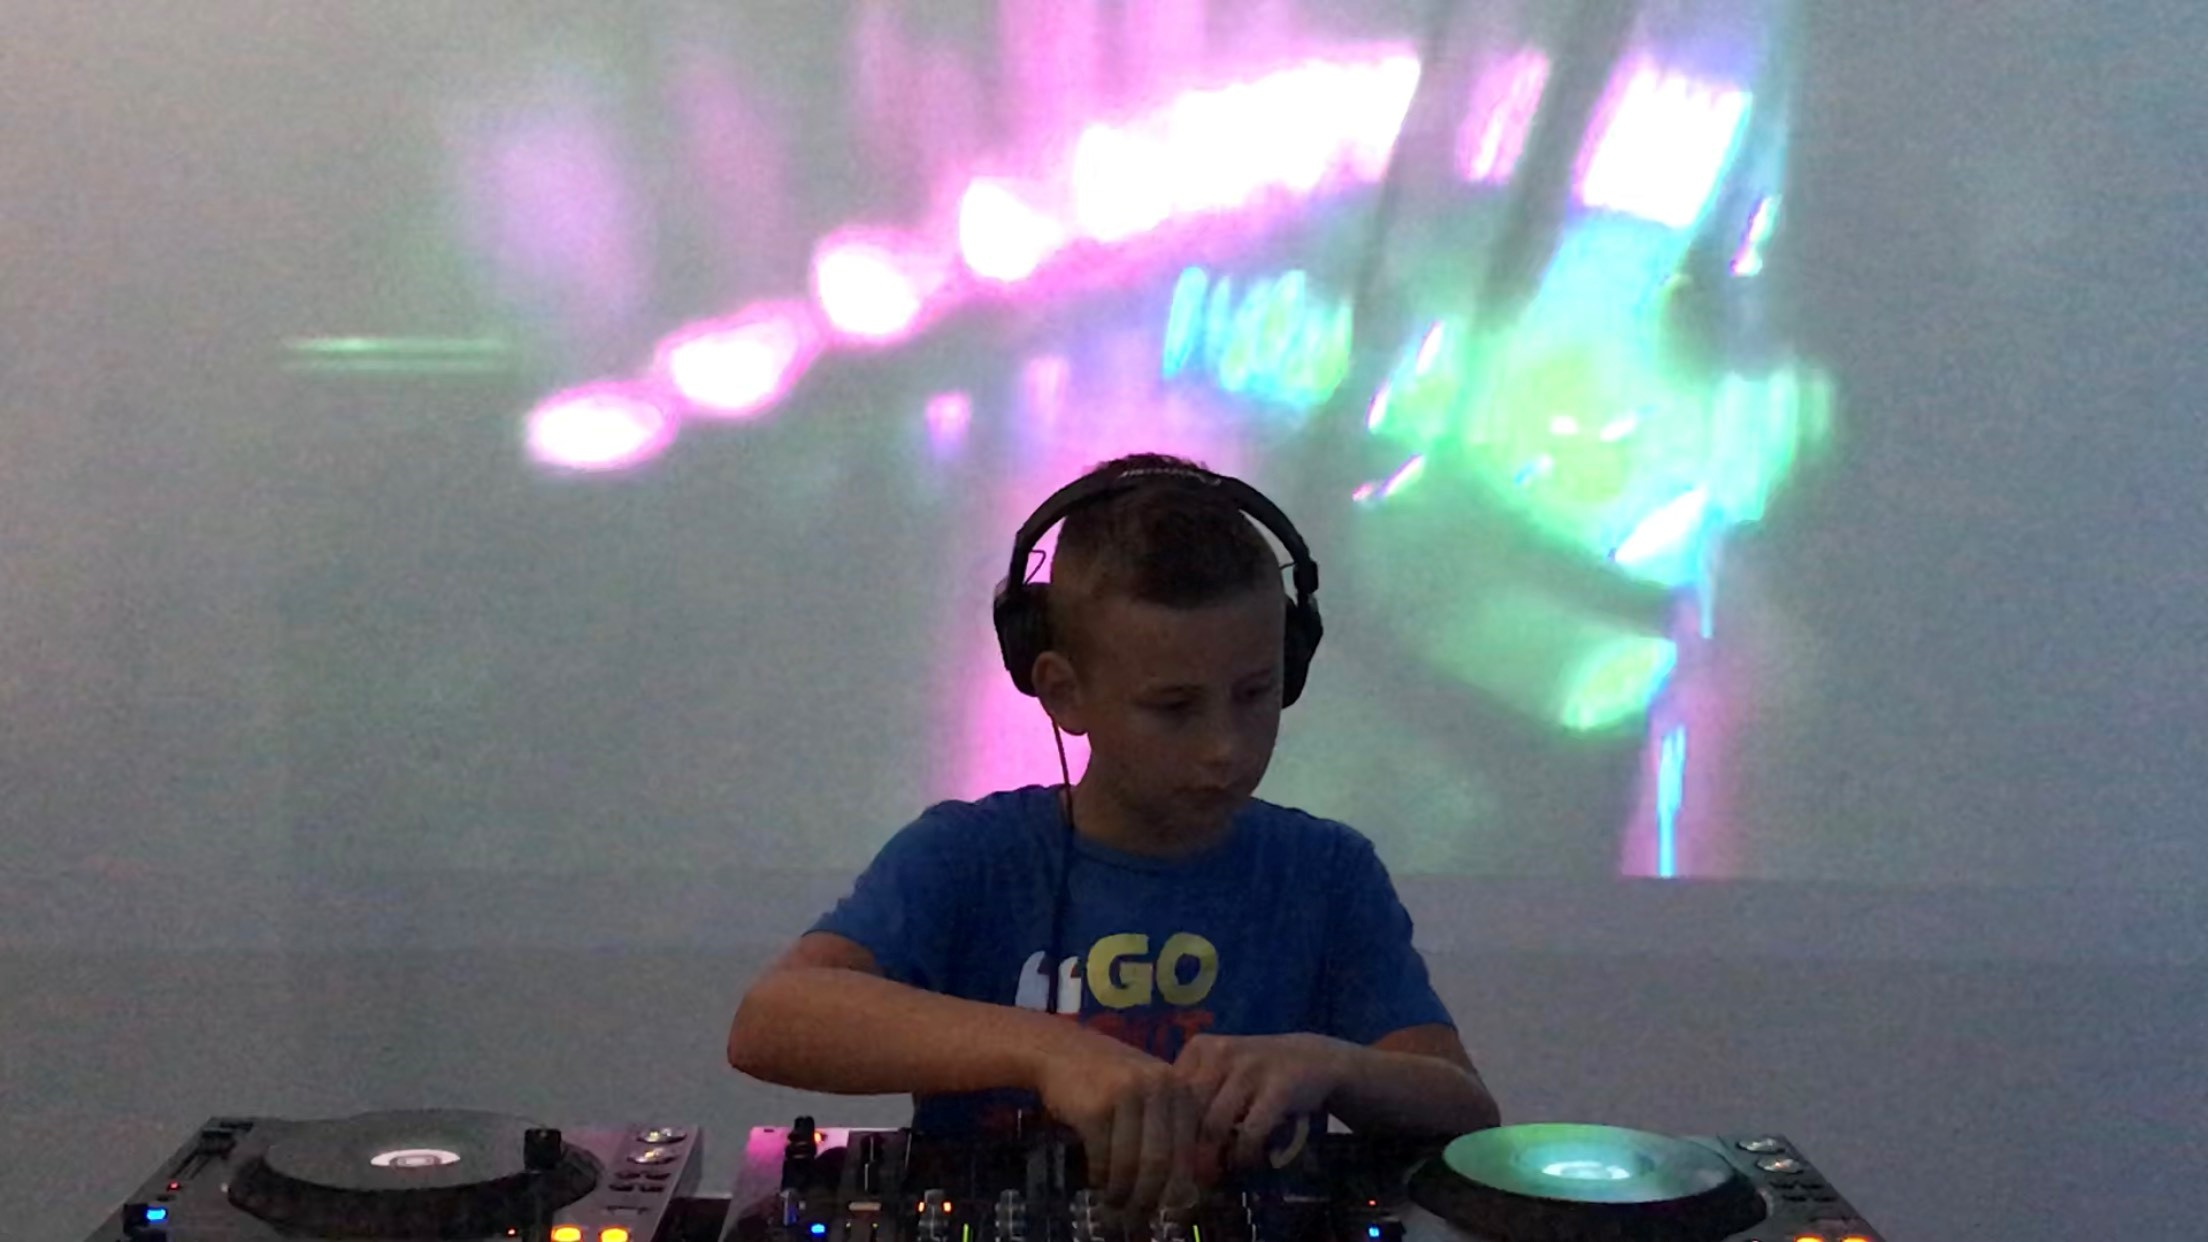 Foto persbericht 18 juni 2018 2 - DJ Workshop